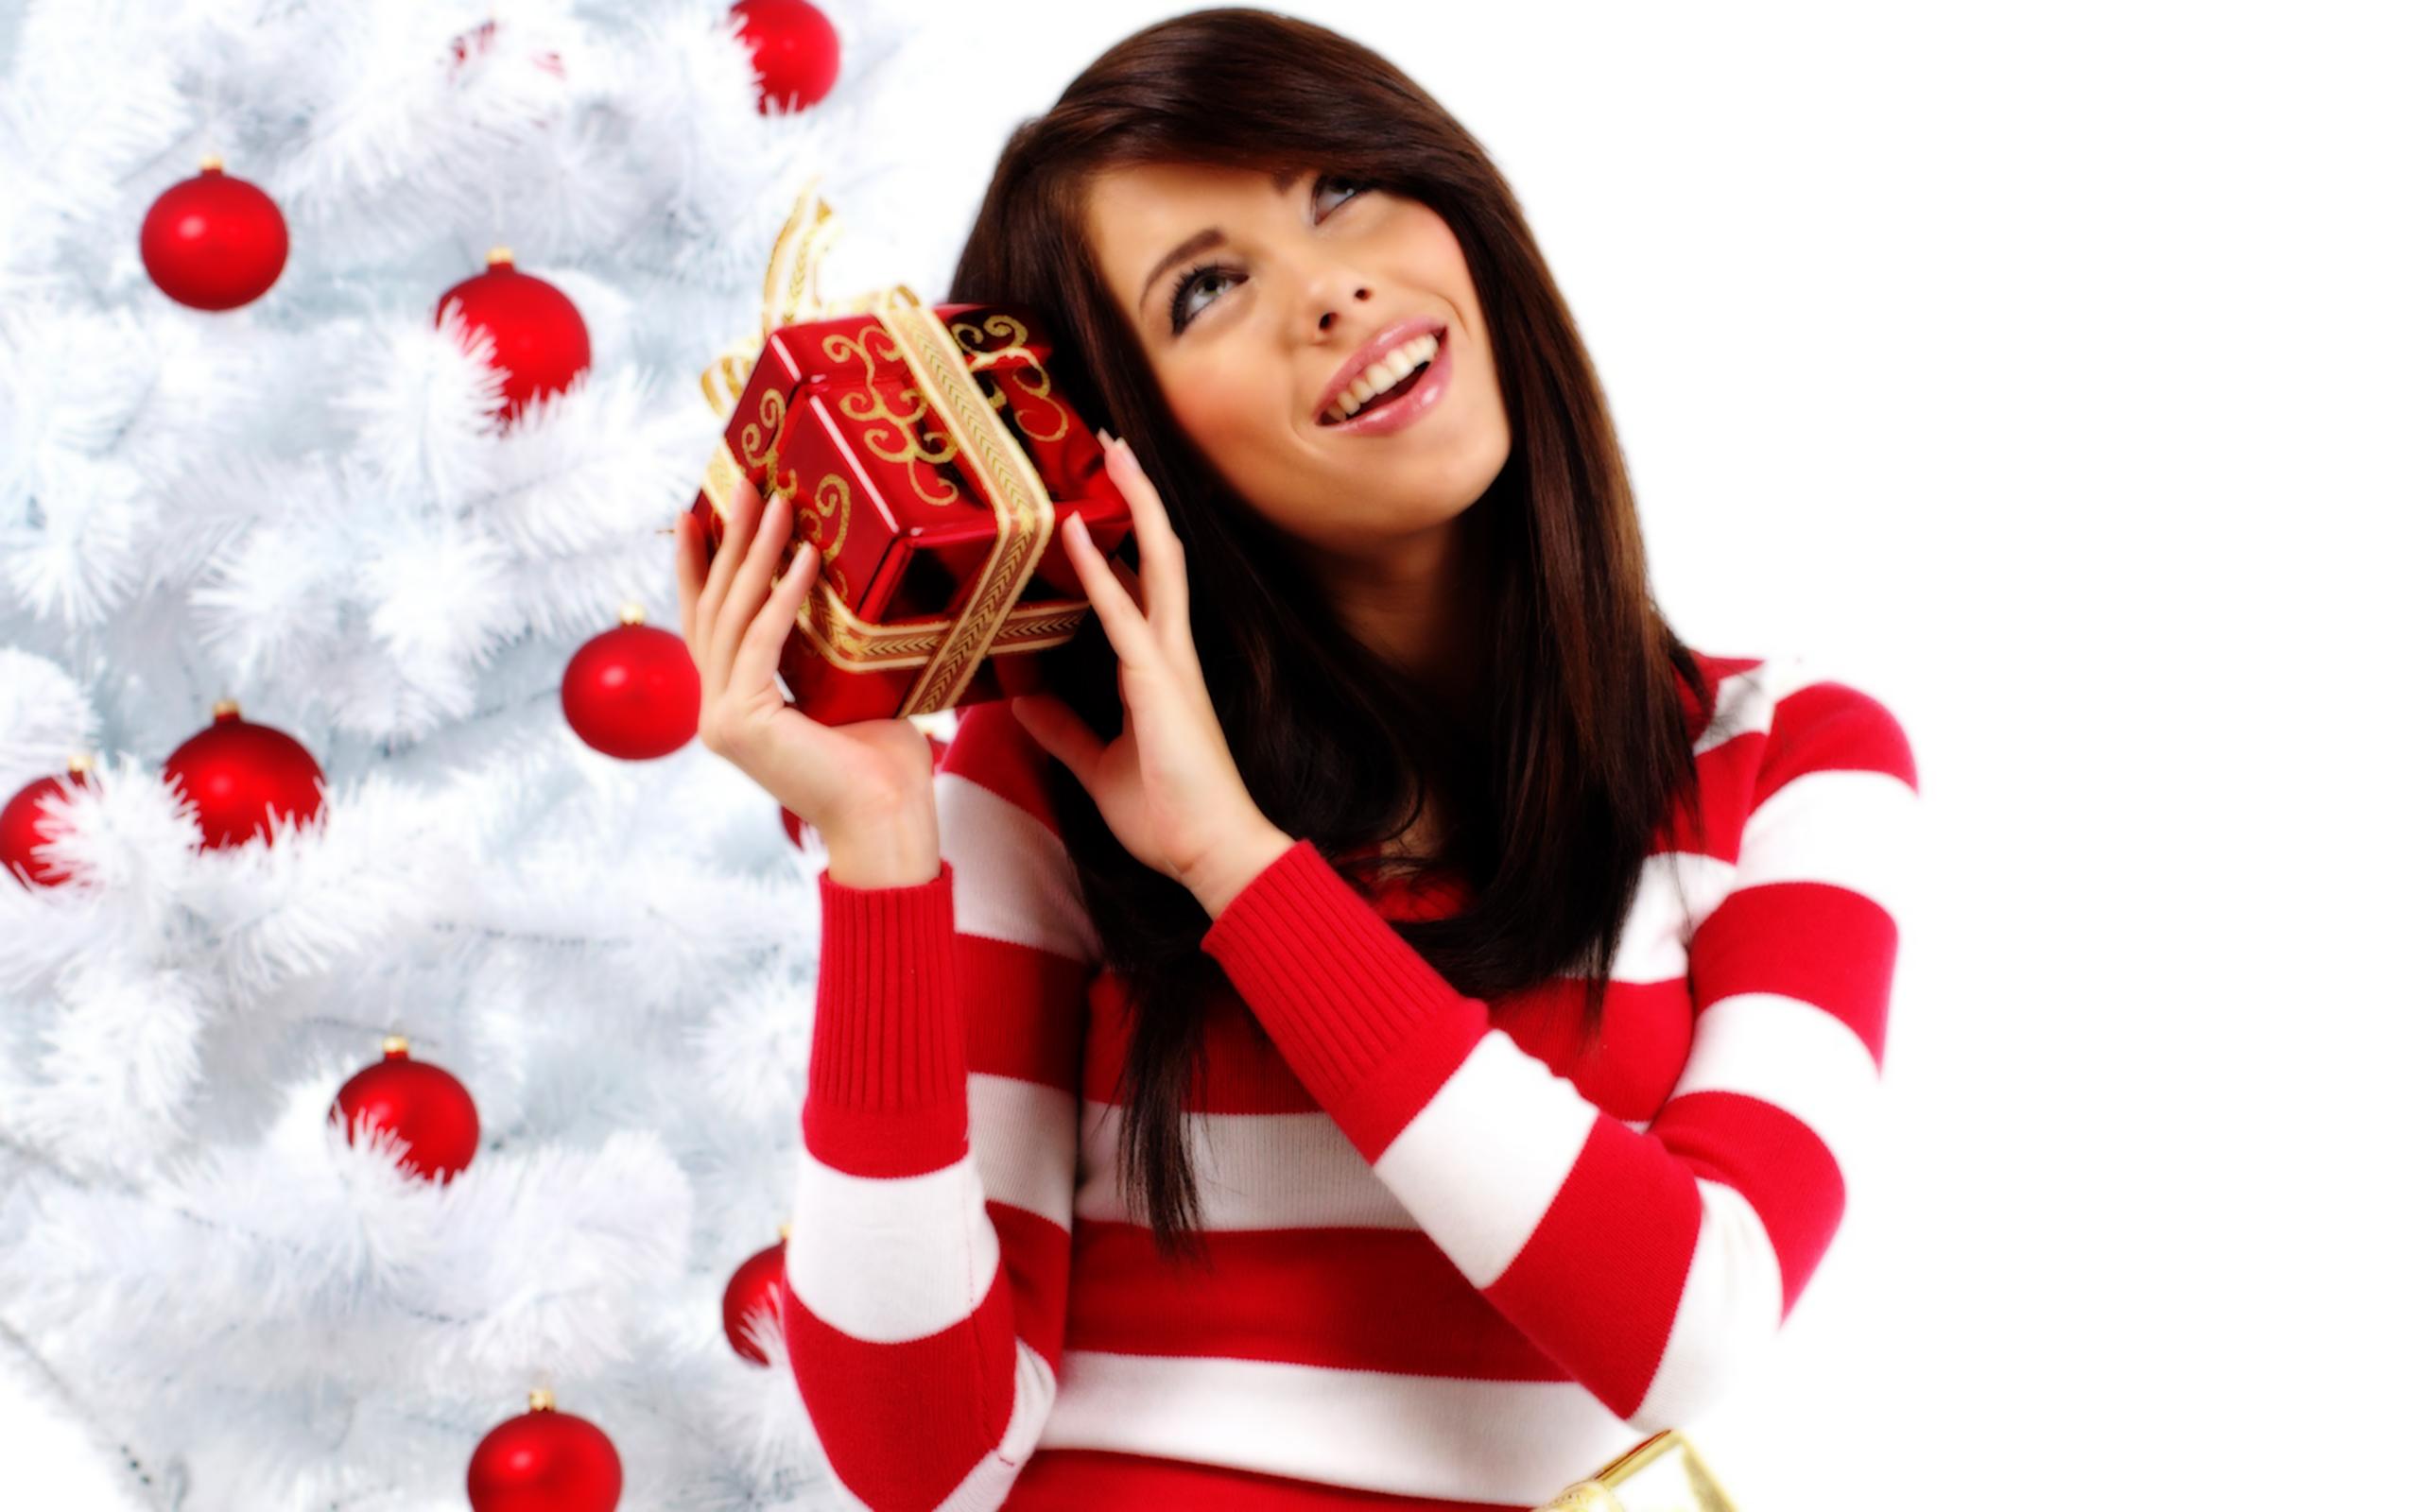 Christmas Babes Wallpapers Group (31+)